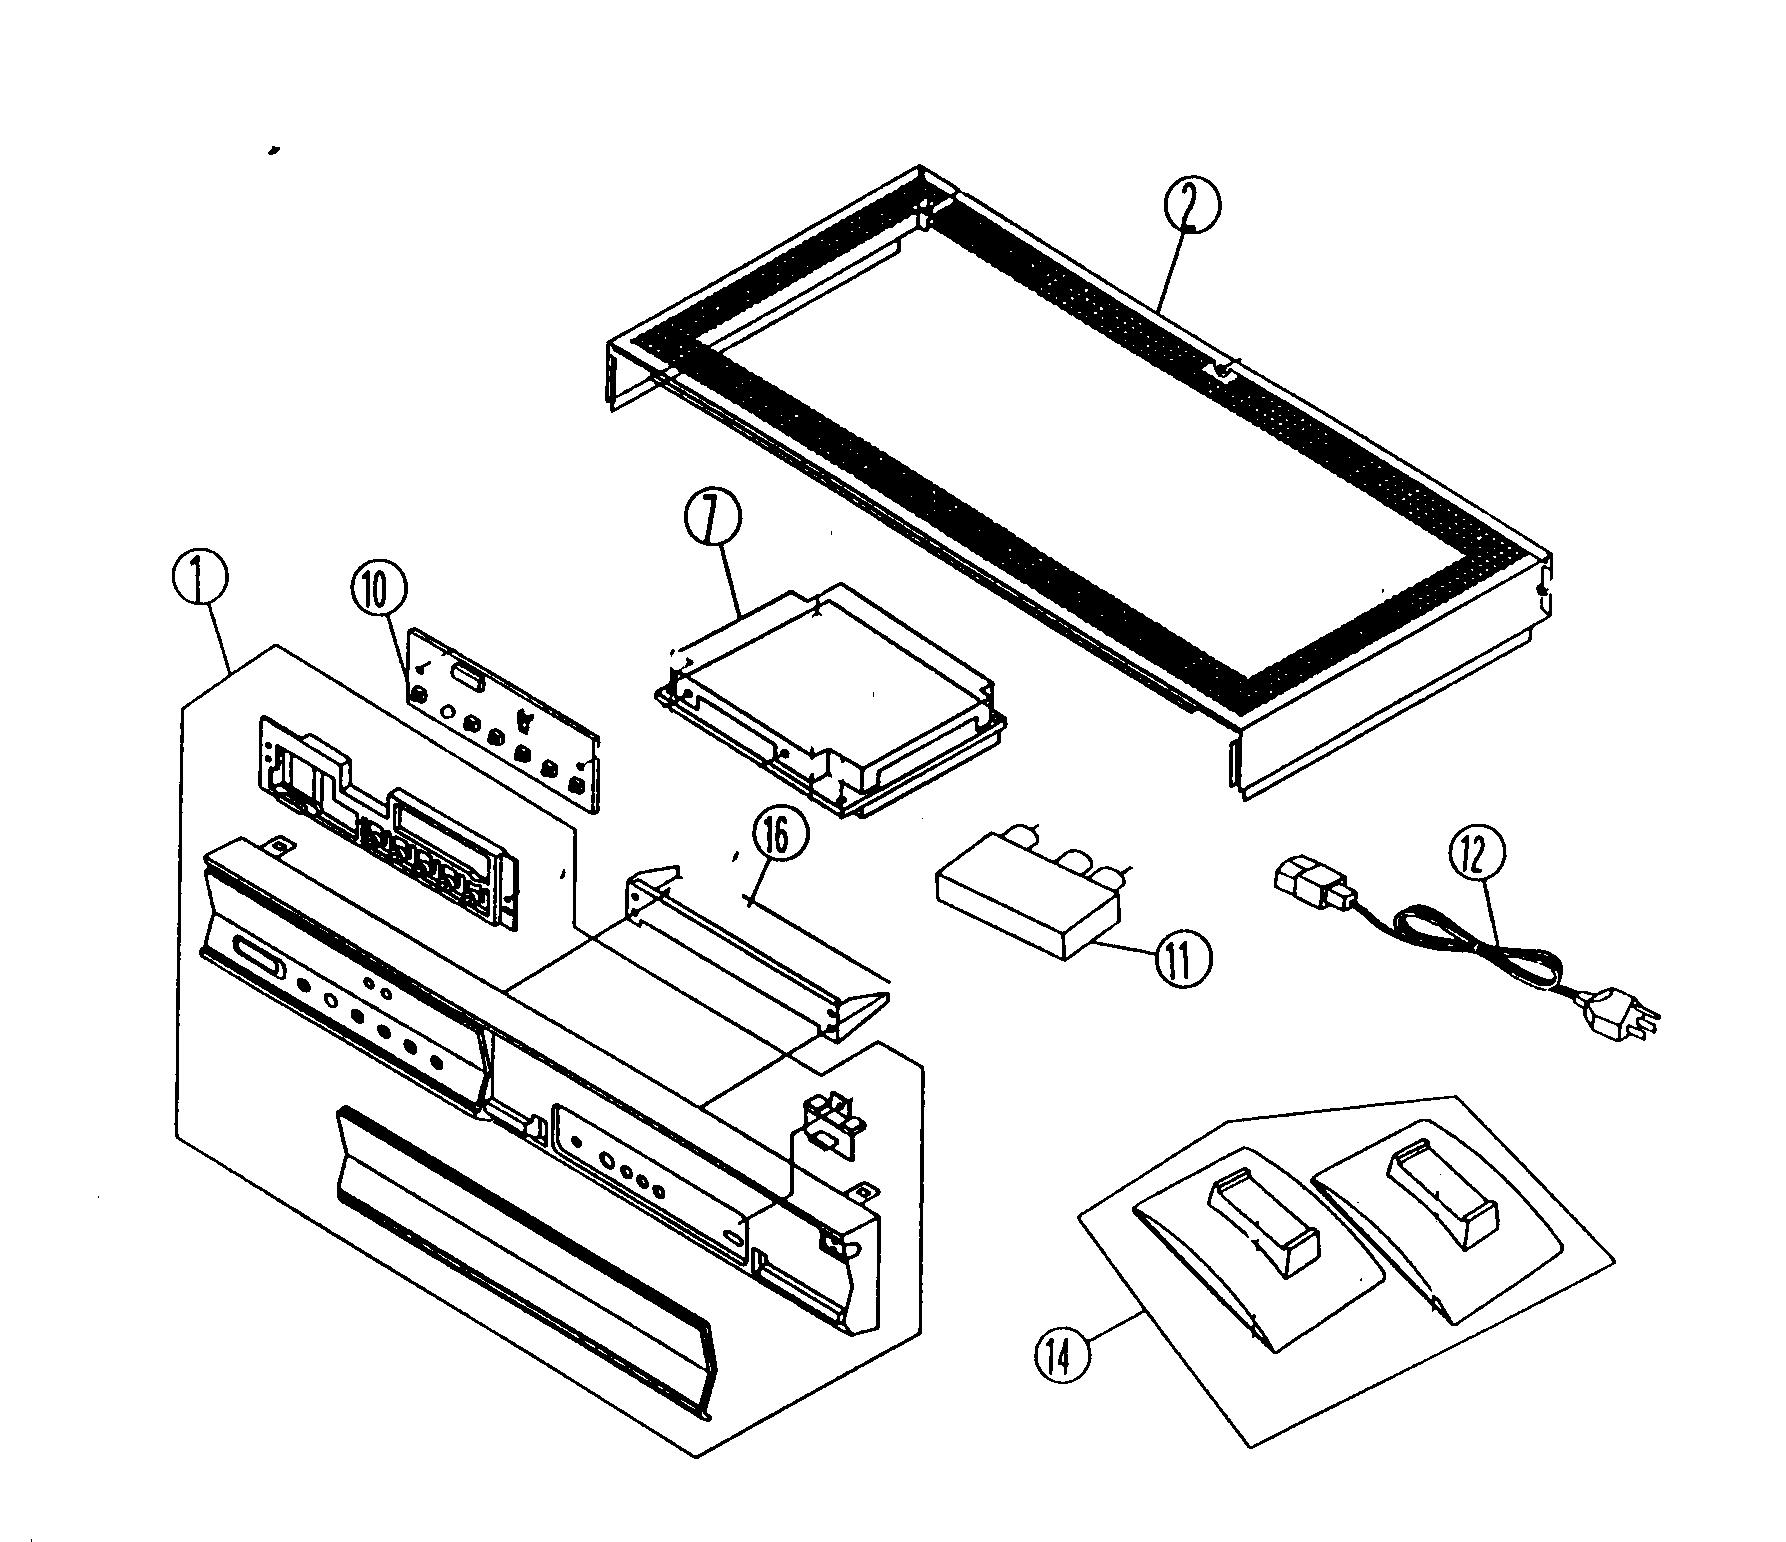 Hitachi model 42HDT50 plasma television genuine parts